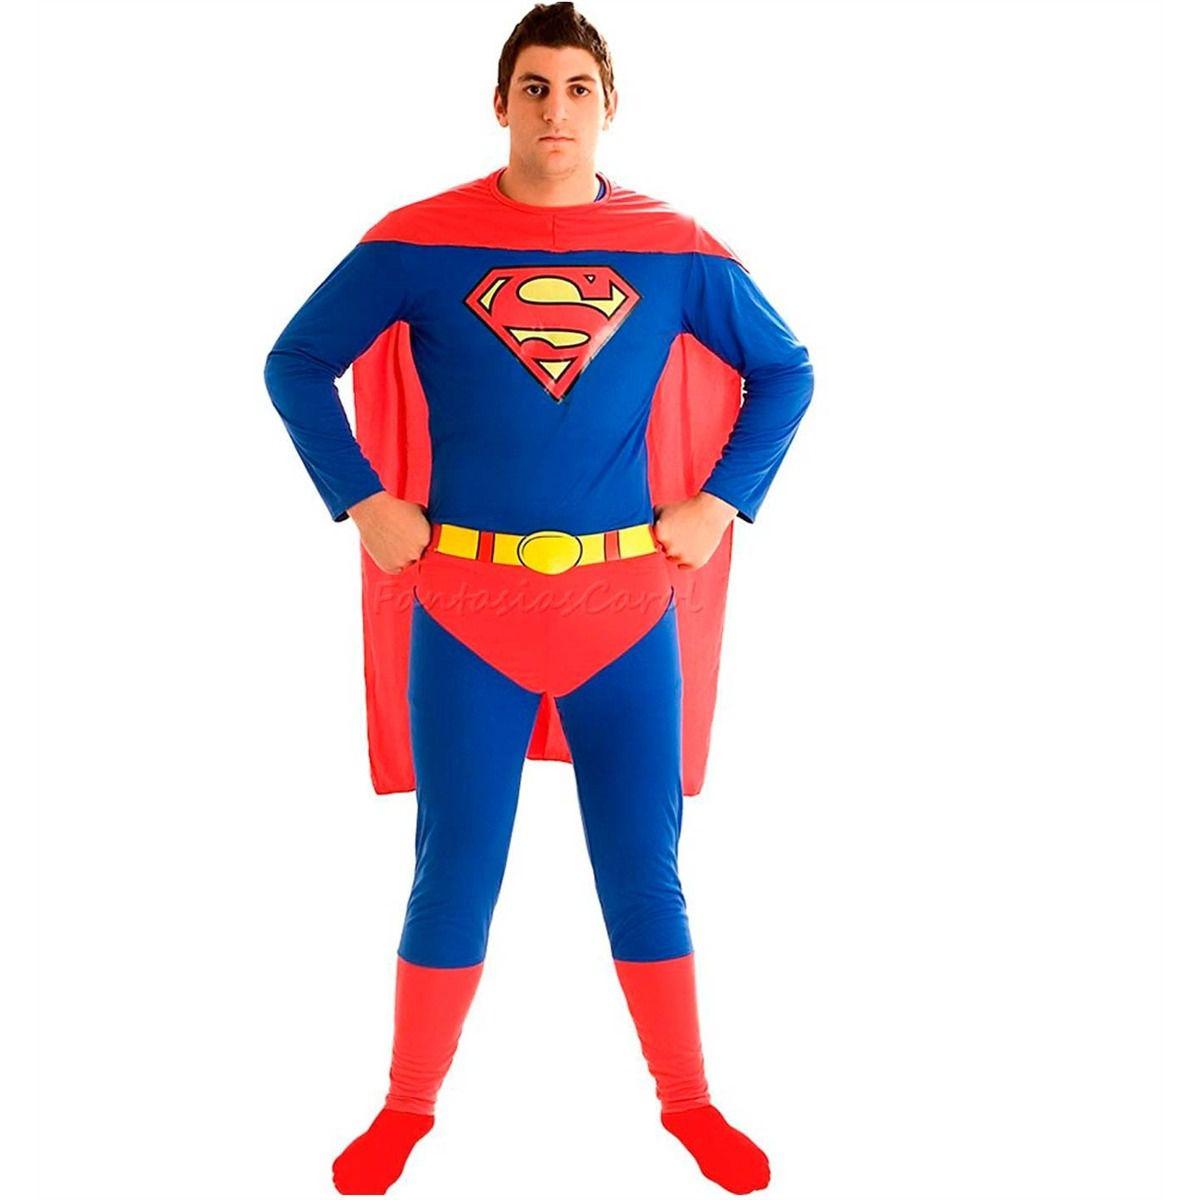 Fantasia Super Homem / Superman Adulto Sulamericana